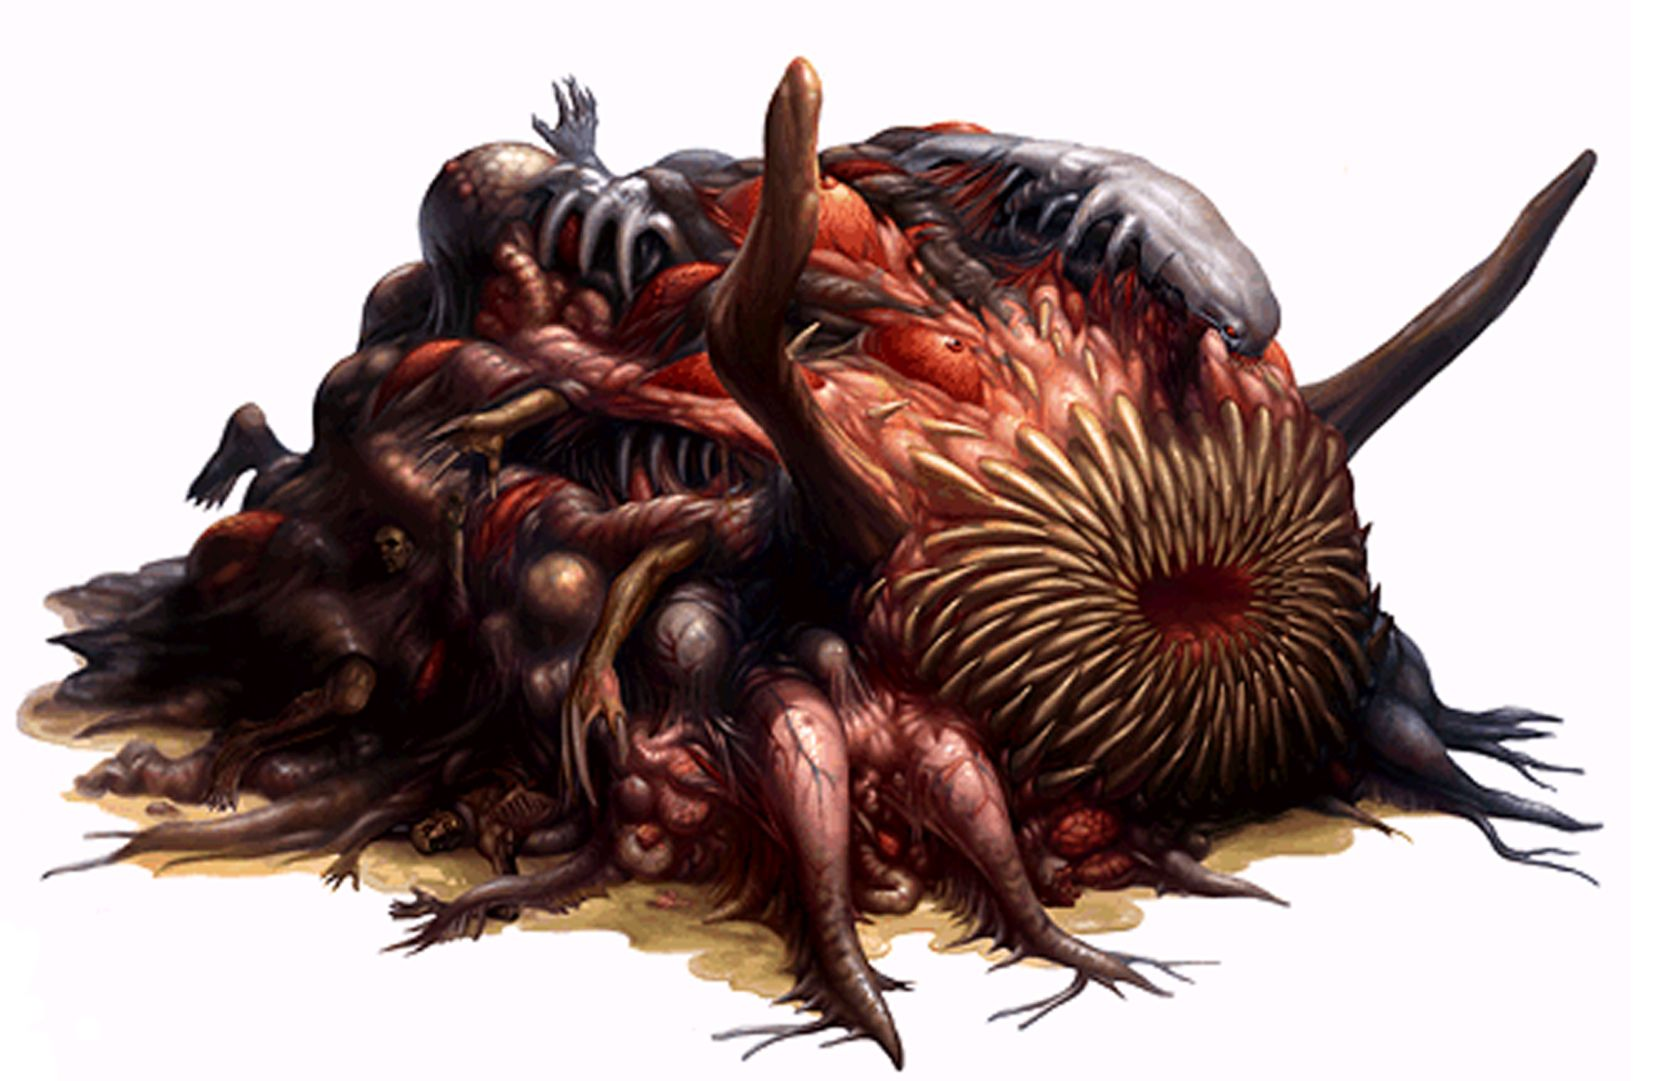 Resident Evil 2 William Birkin Final Form Resident Evil Monsters